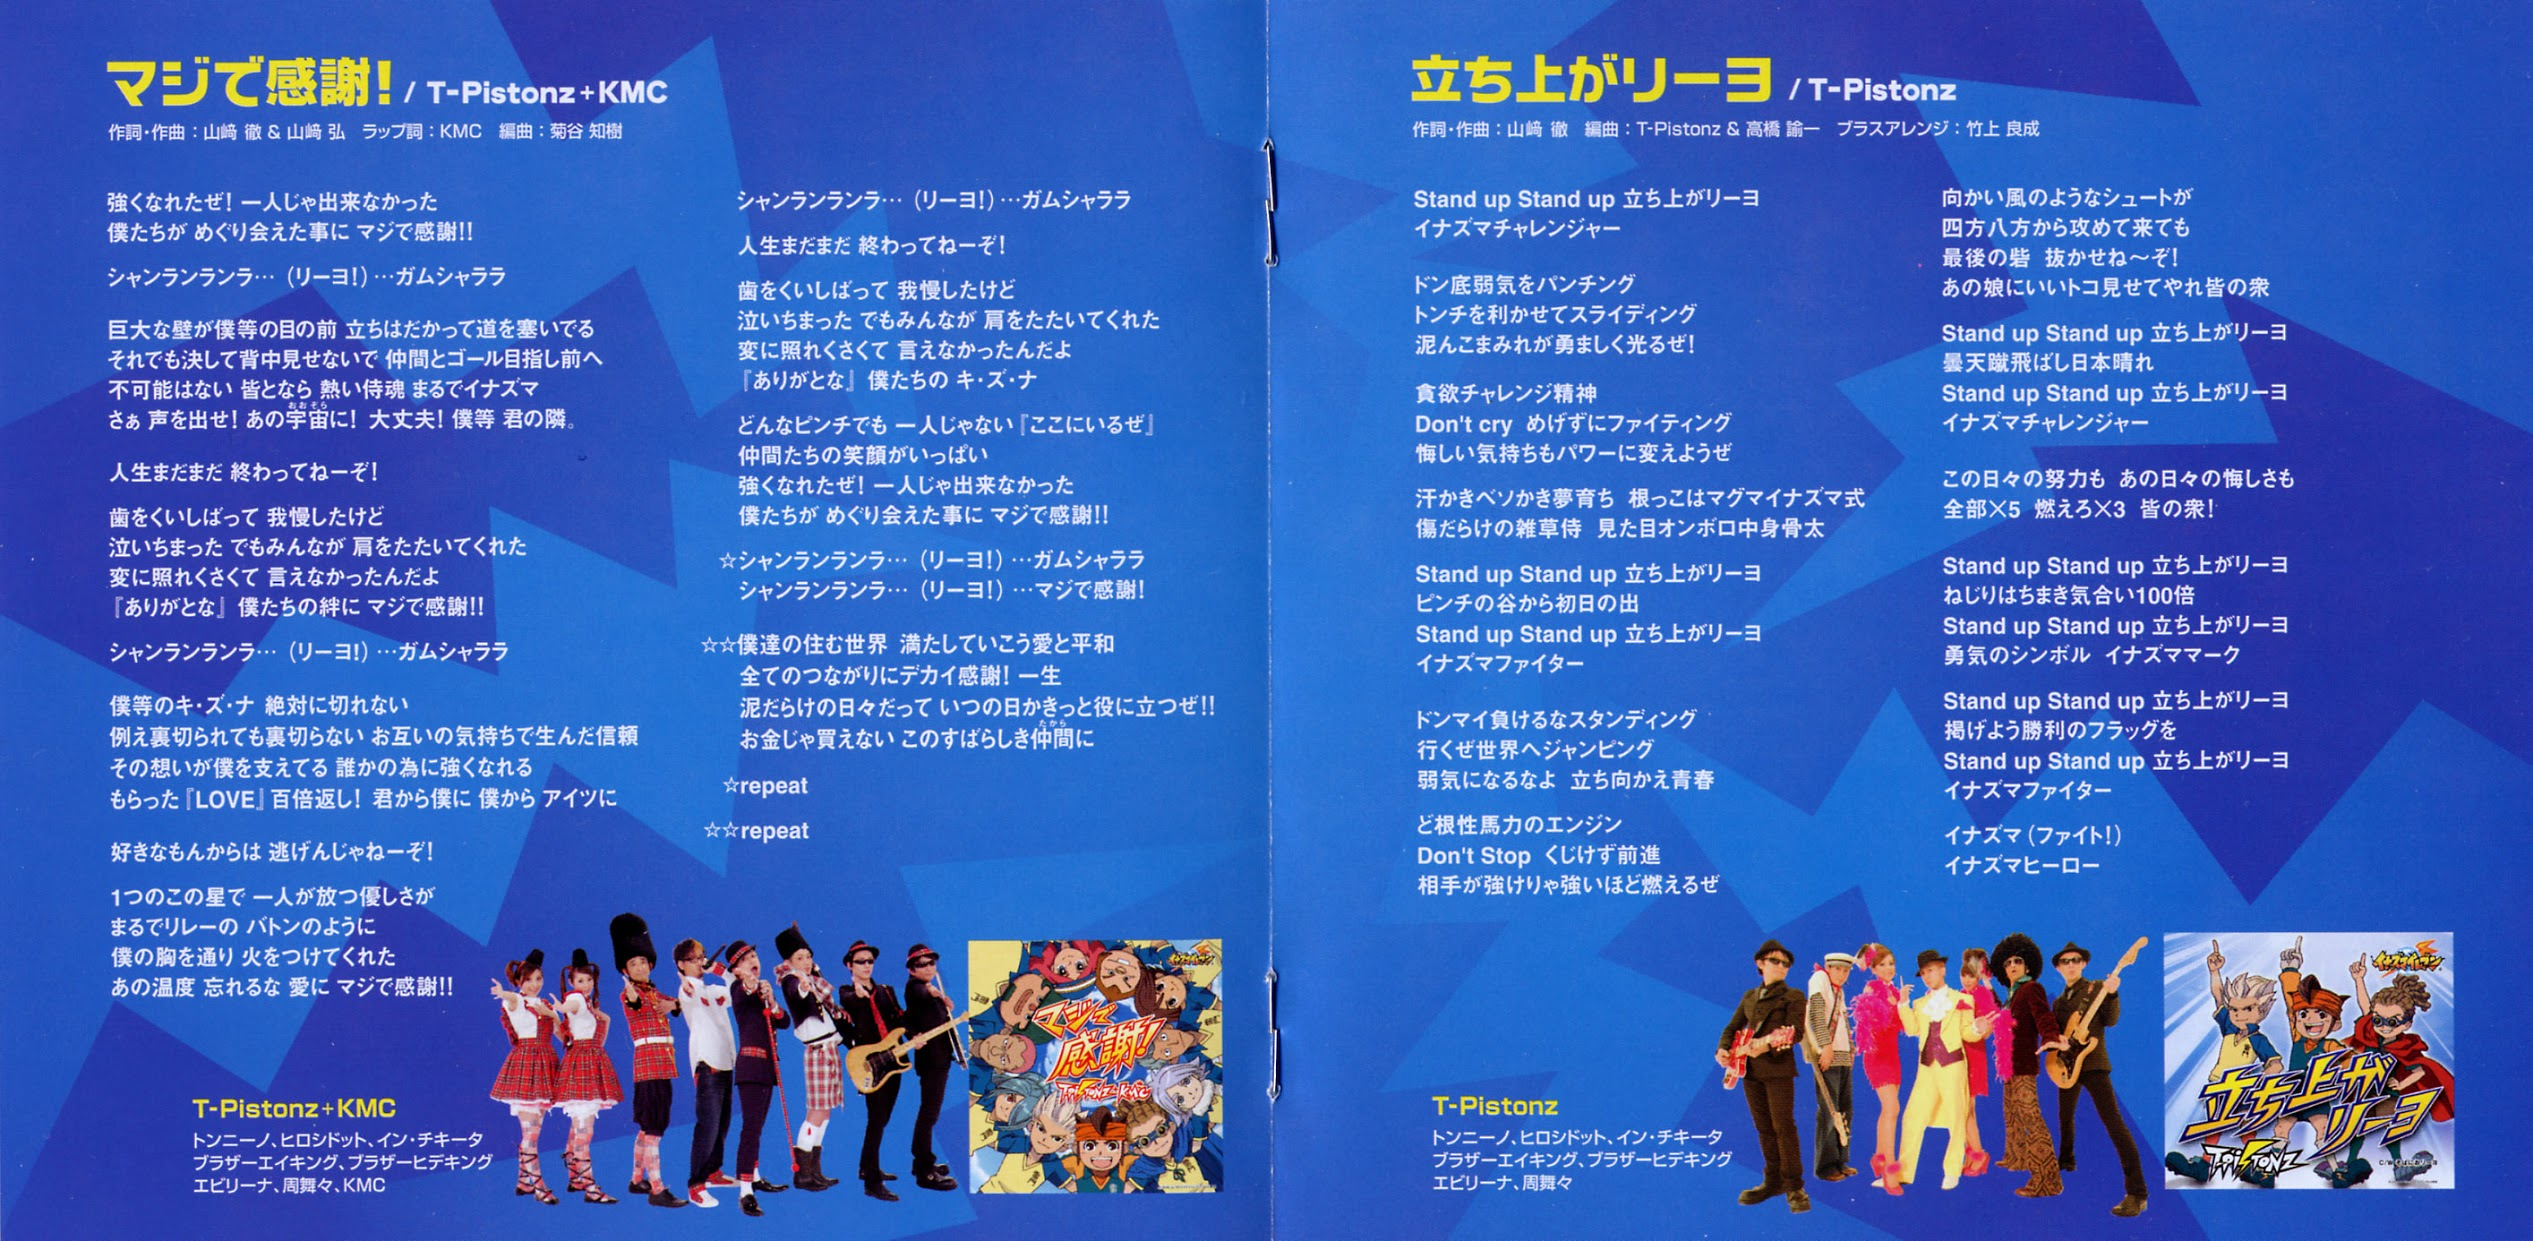 Nfs Underground 2 Ps2 Instruction Booklet